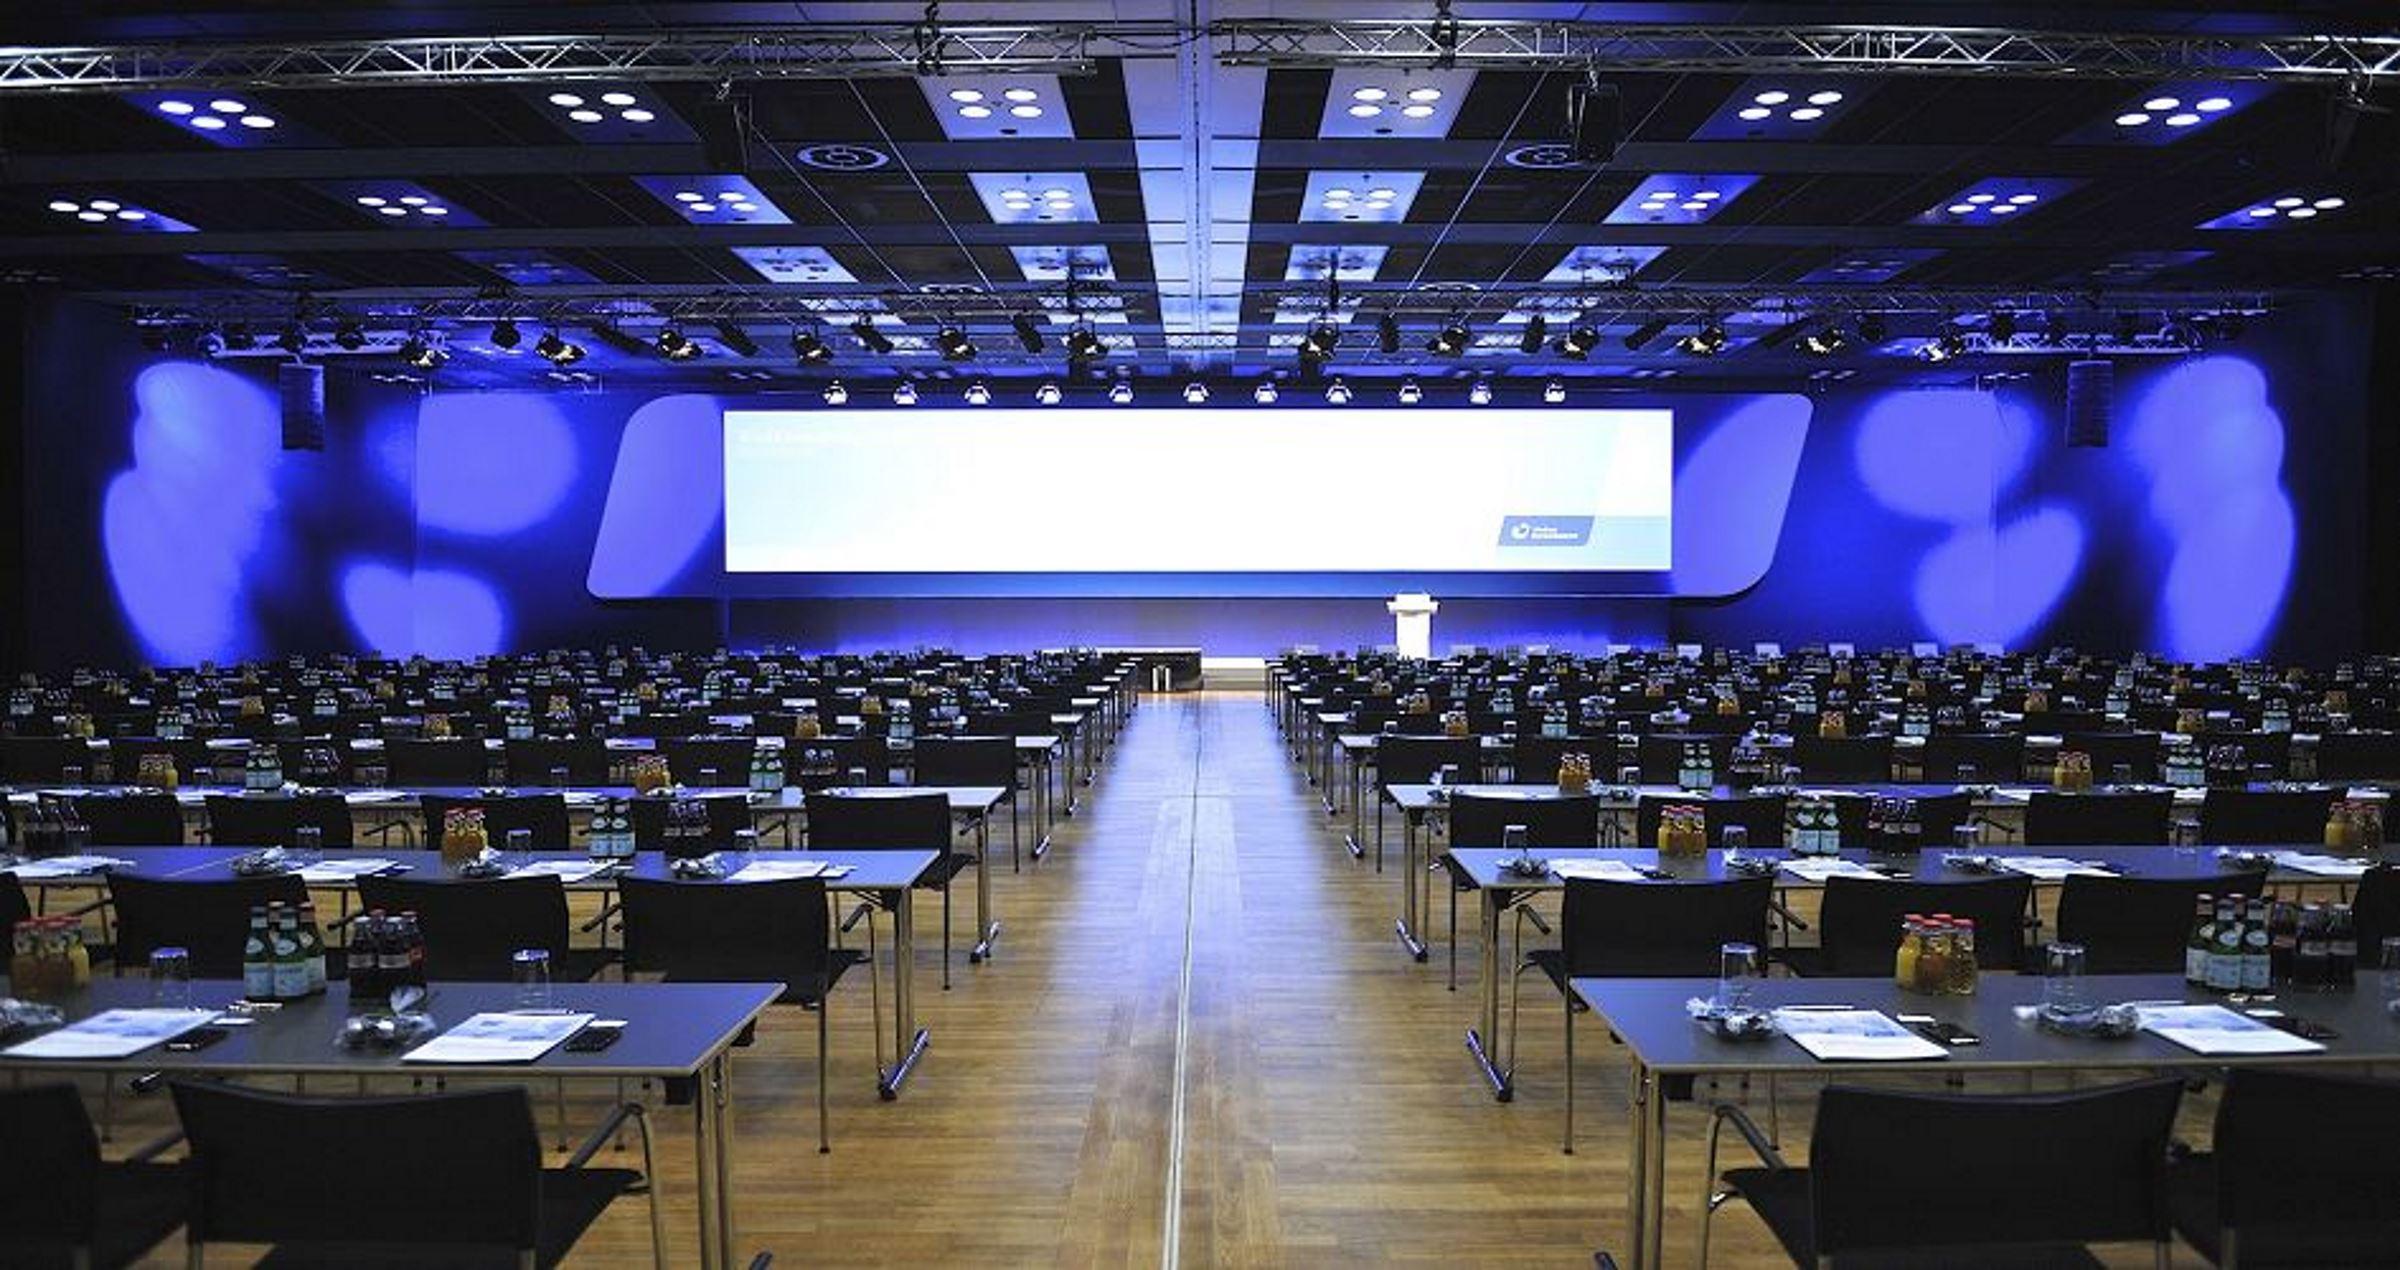 Kongress Saal Rheingoldhalle